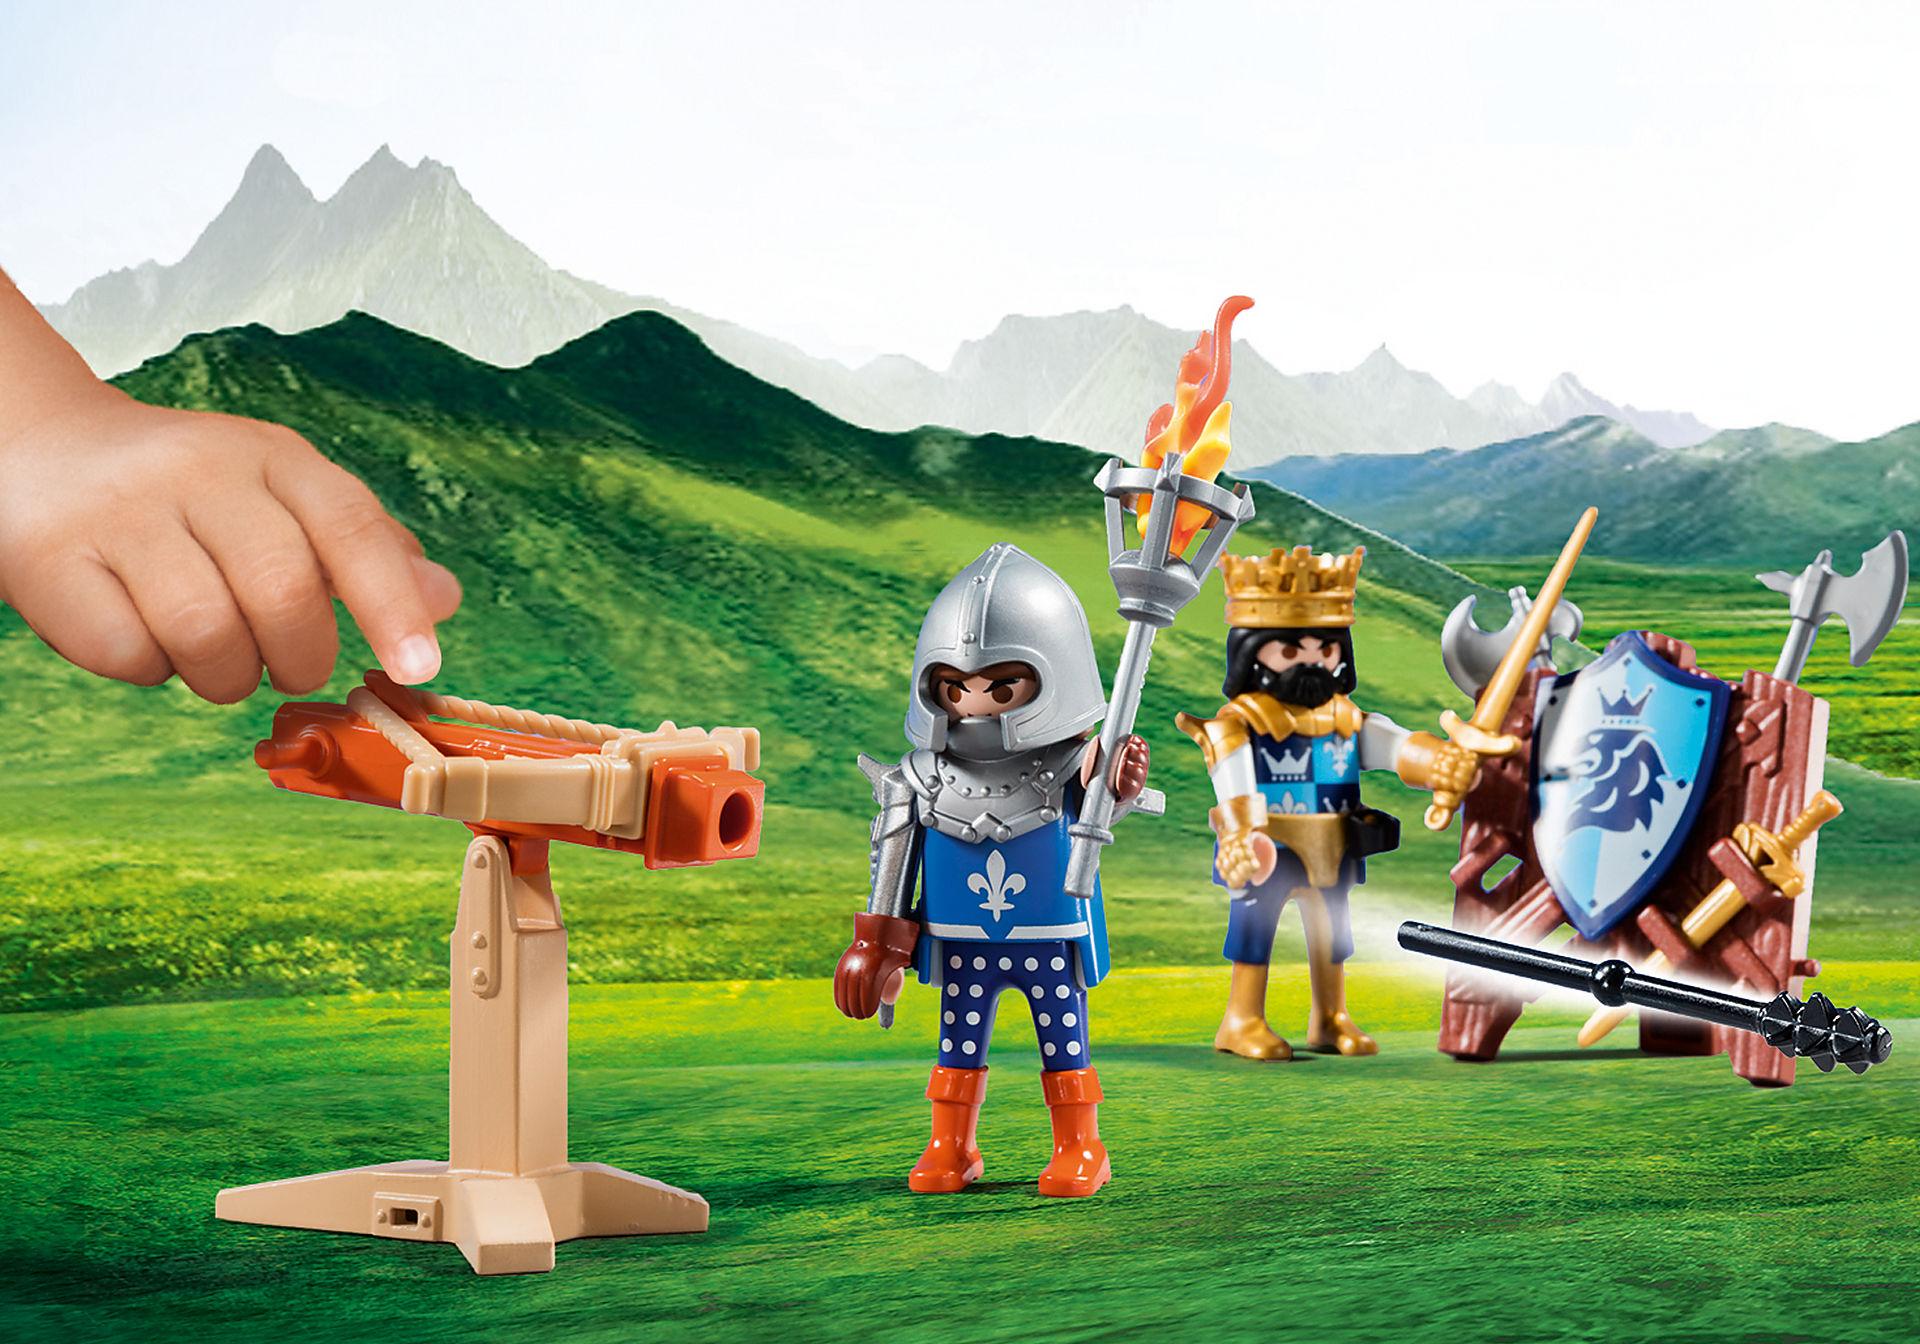 http://media.playmobil.com/i/playmobil/5659_product_extra1/Play Box - Knights